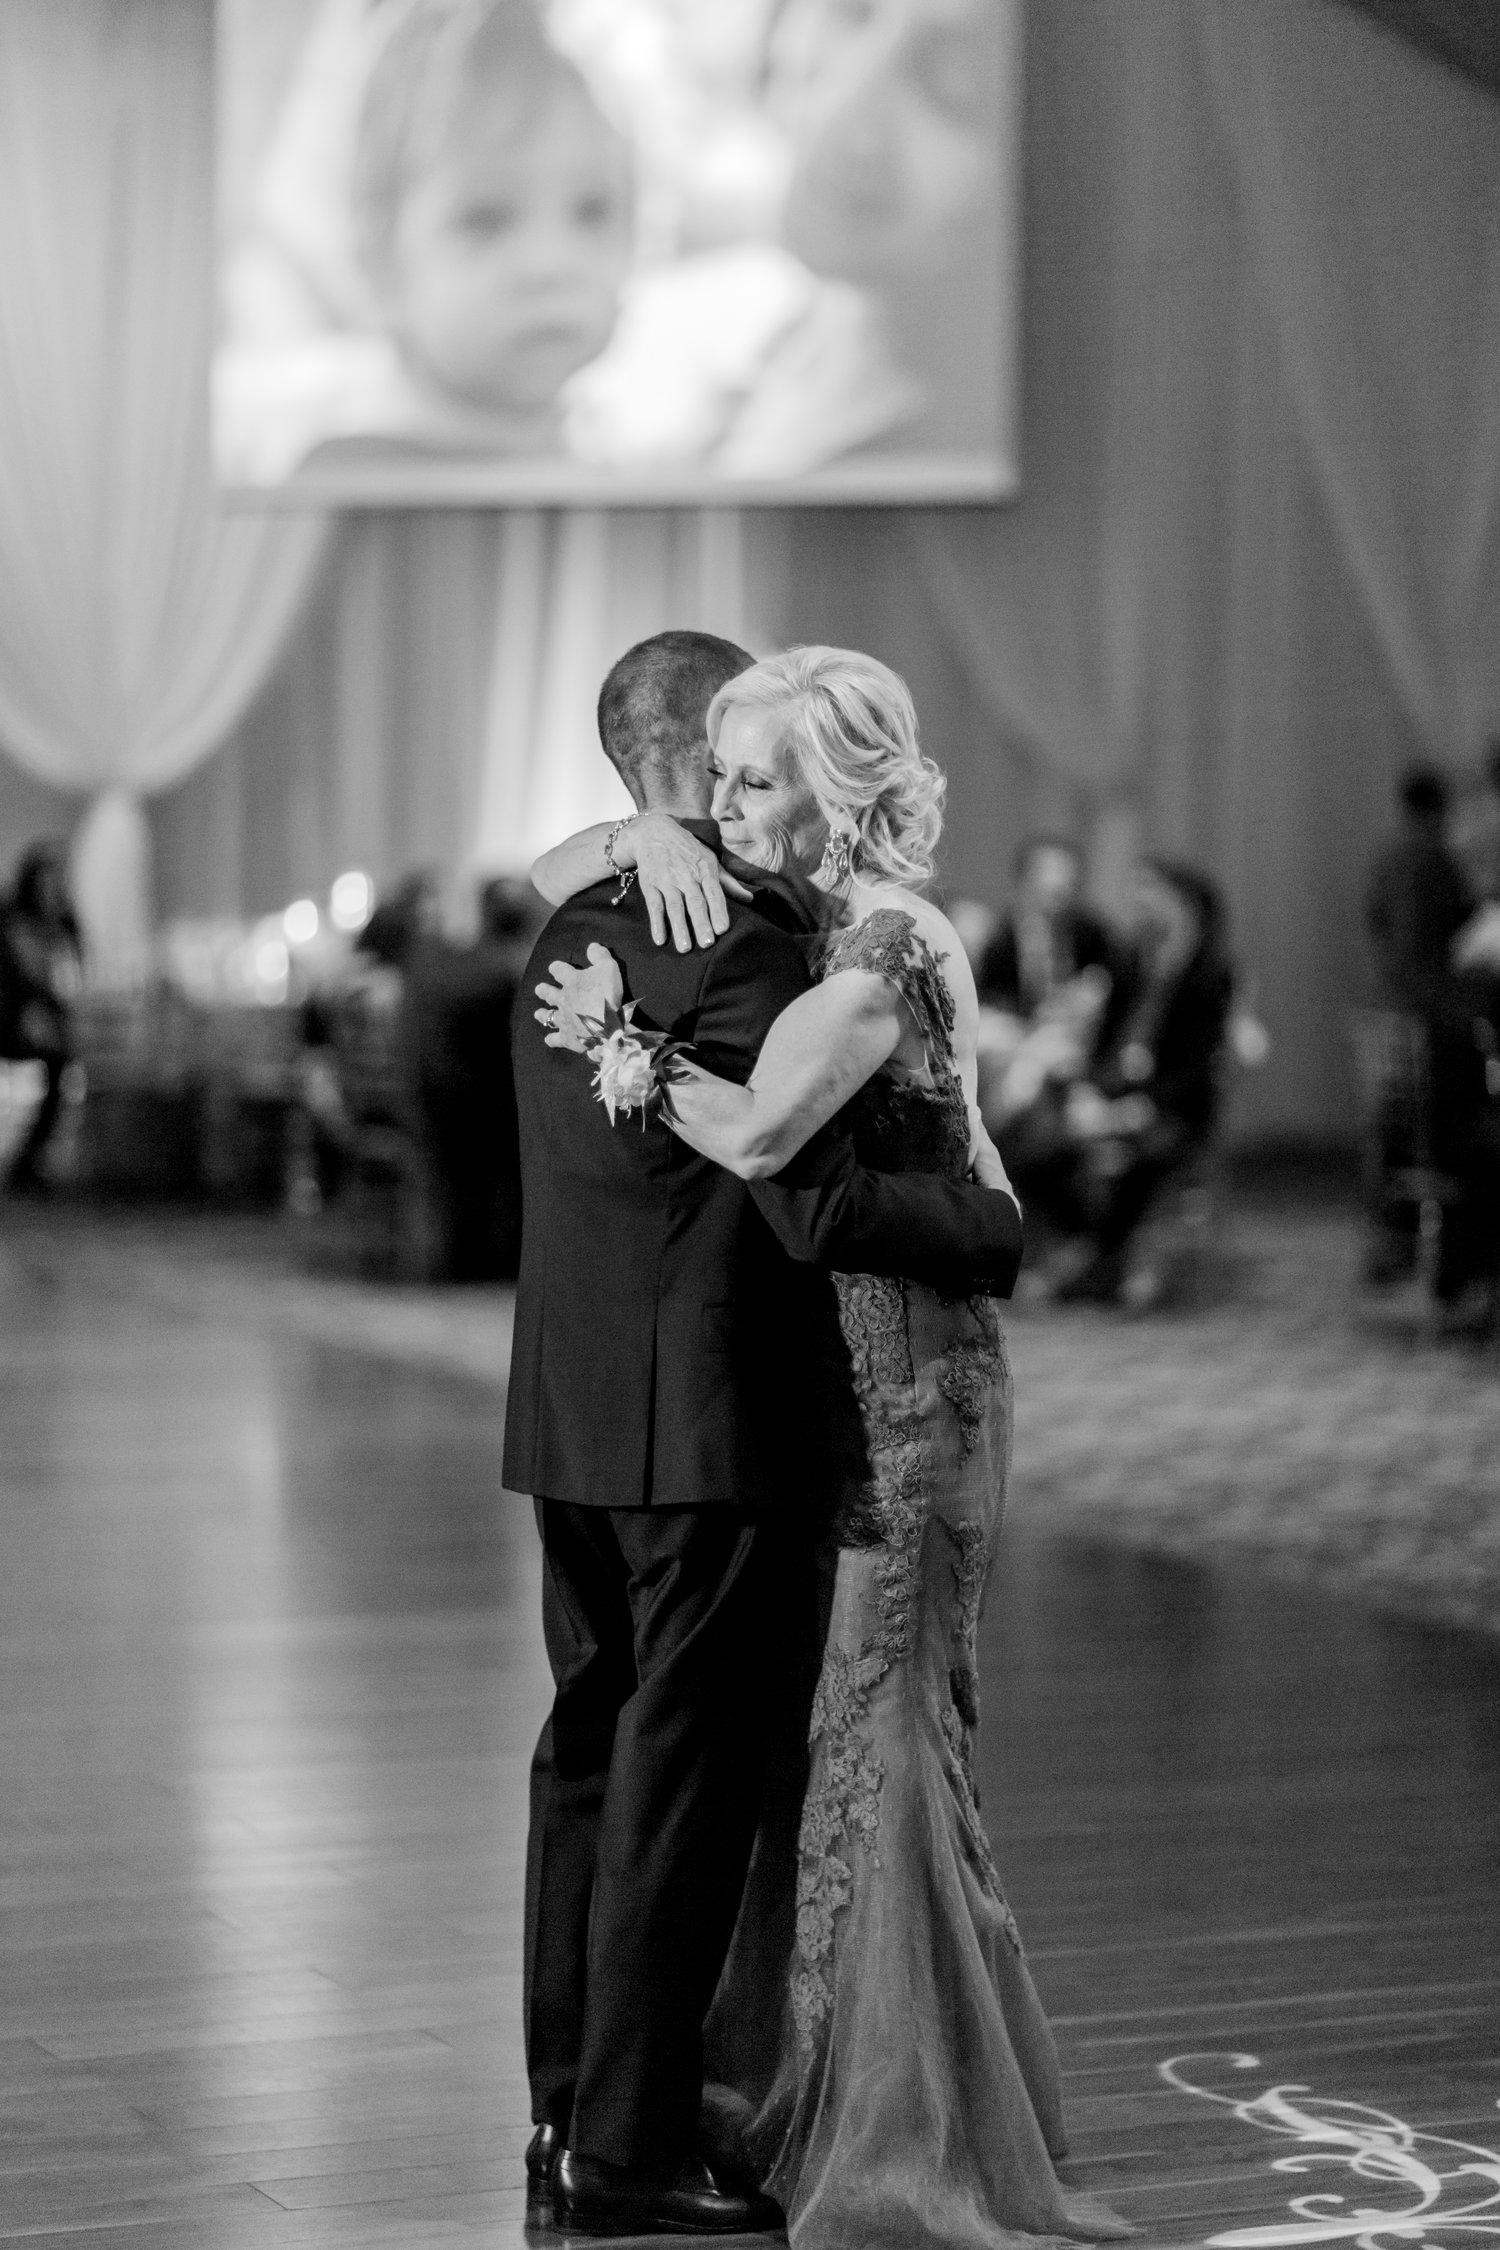 Danielle-Giroux-Amir-Golbazi-Toronto-Wedding-Photographer-Bellvue-Manor_DeLuca_2-739.jpg